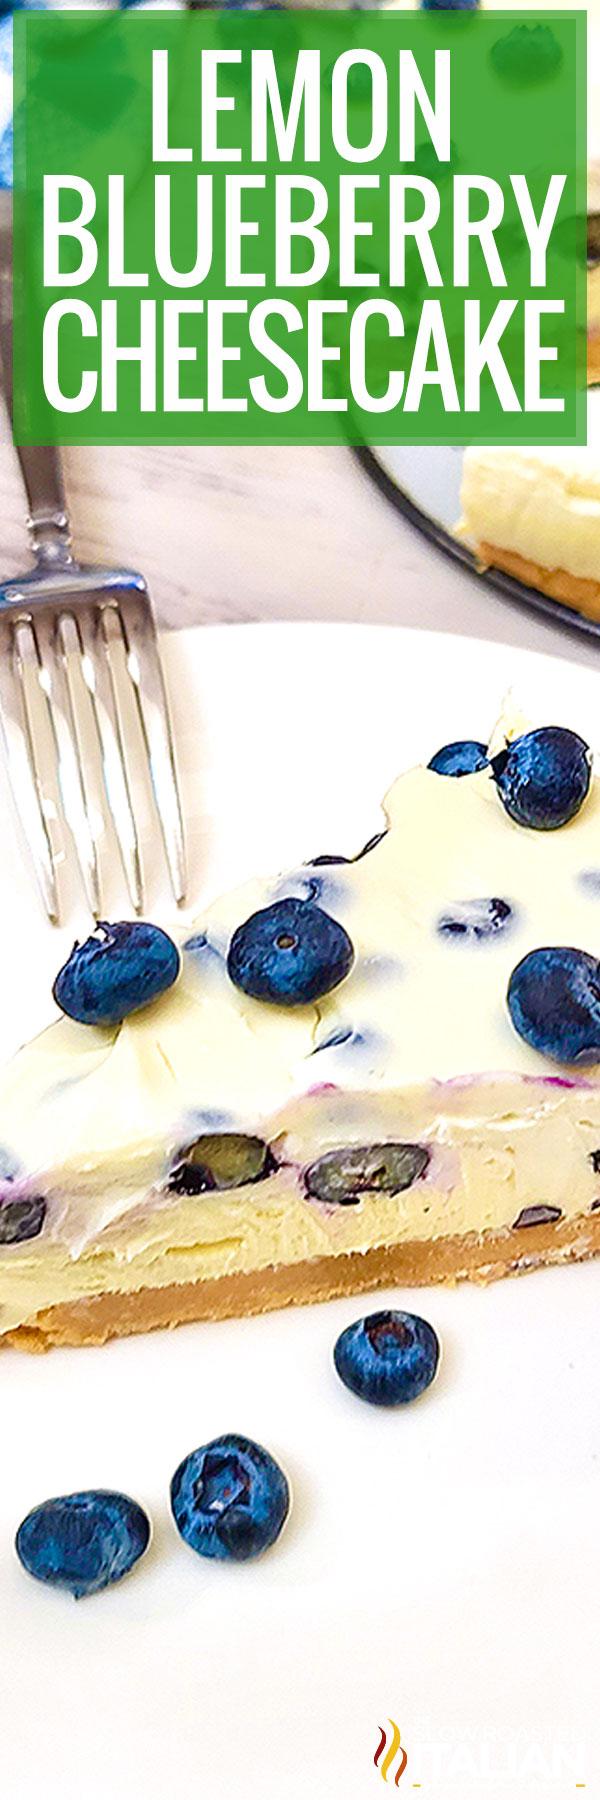 Lemon Blueberry Cheesecake (No Bake)